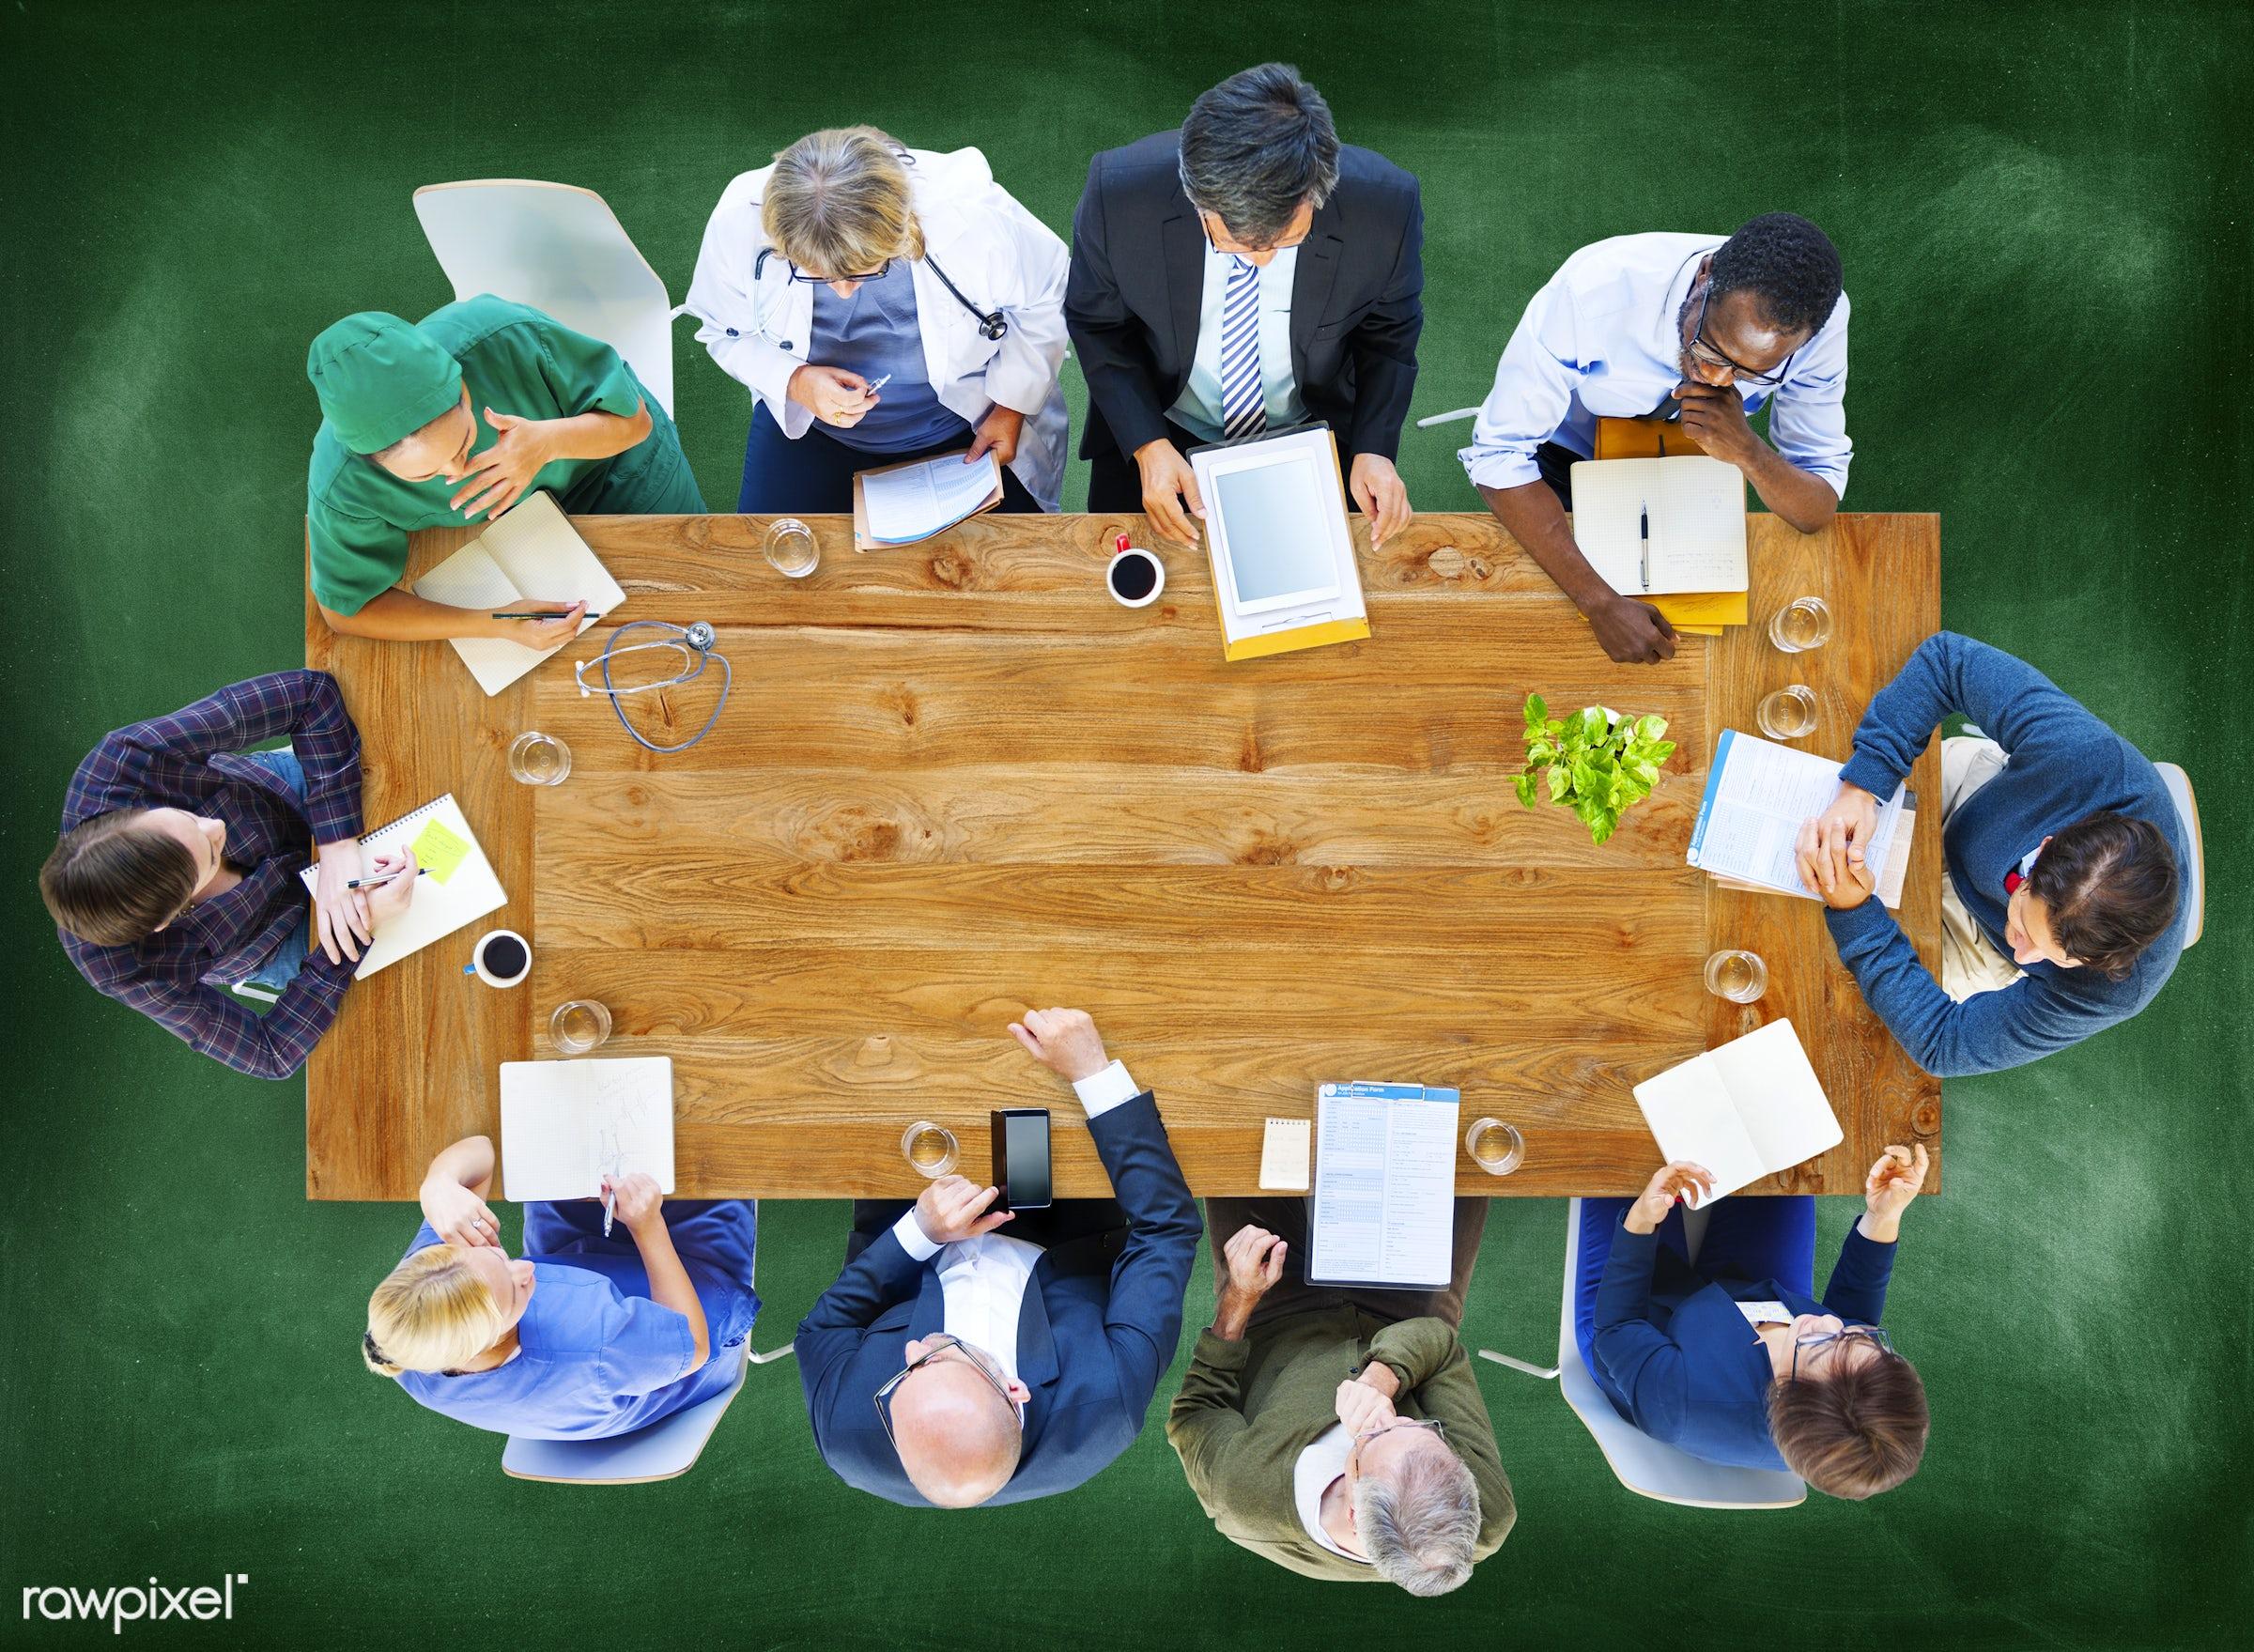 analysing, blackboard, chalkboard, concrete floor, consultant, consultation, diagnose, diagnosis, discussion, disease,...